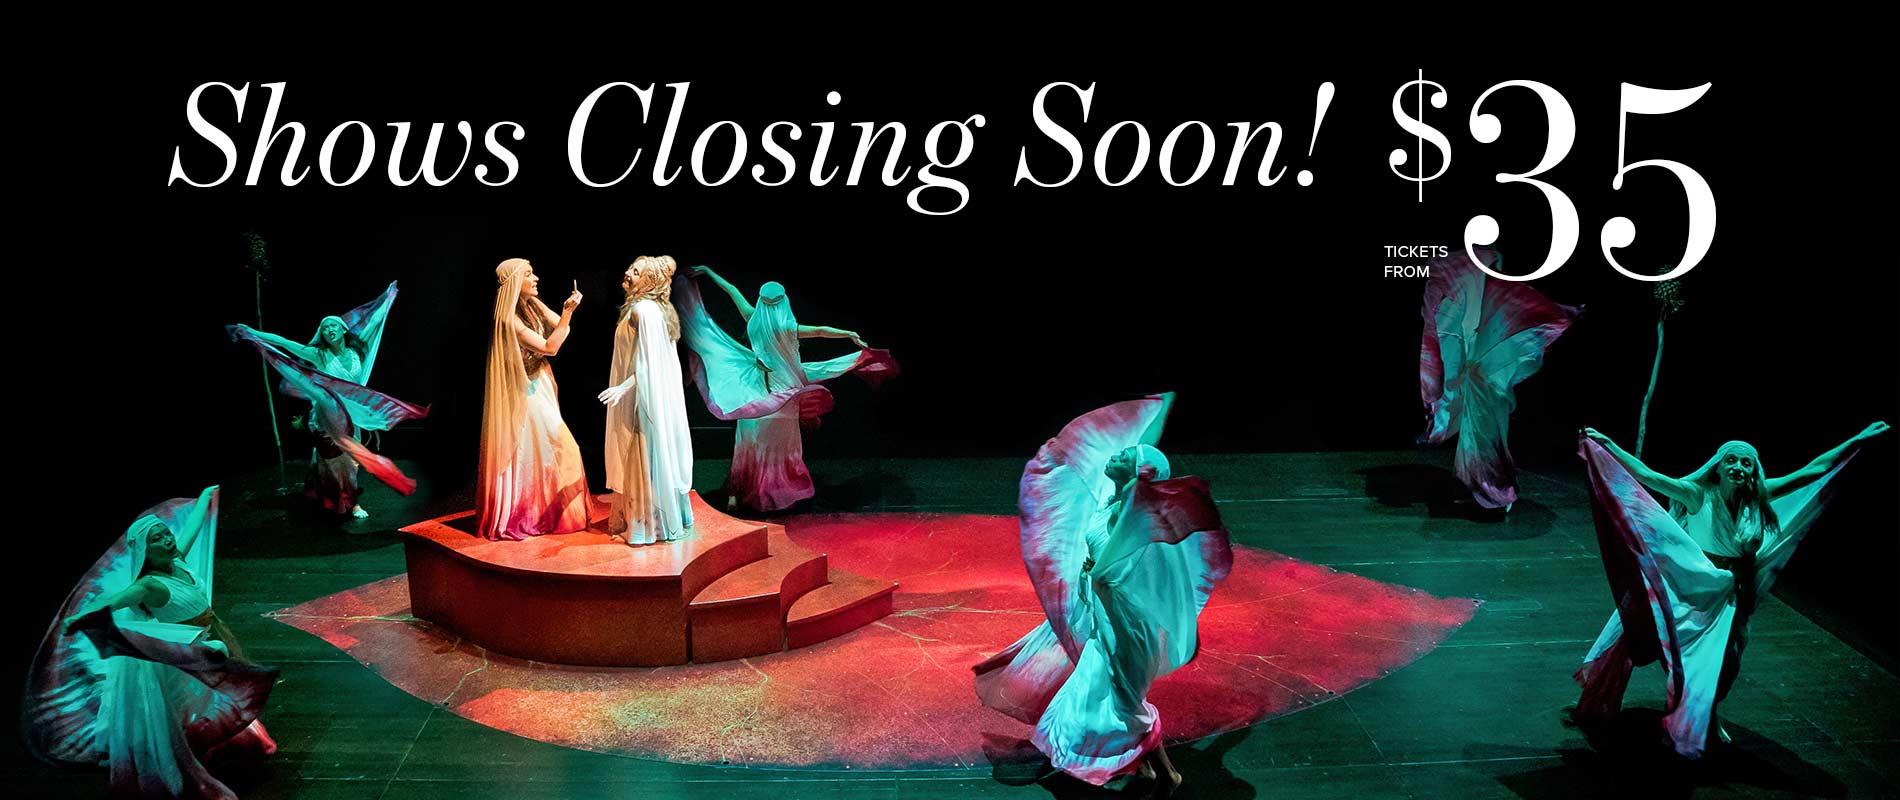 Shows closing soon!